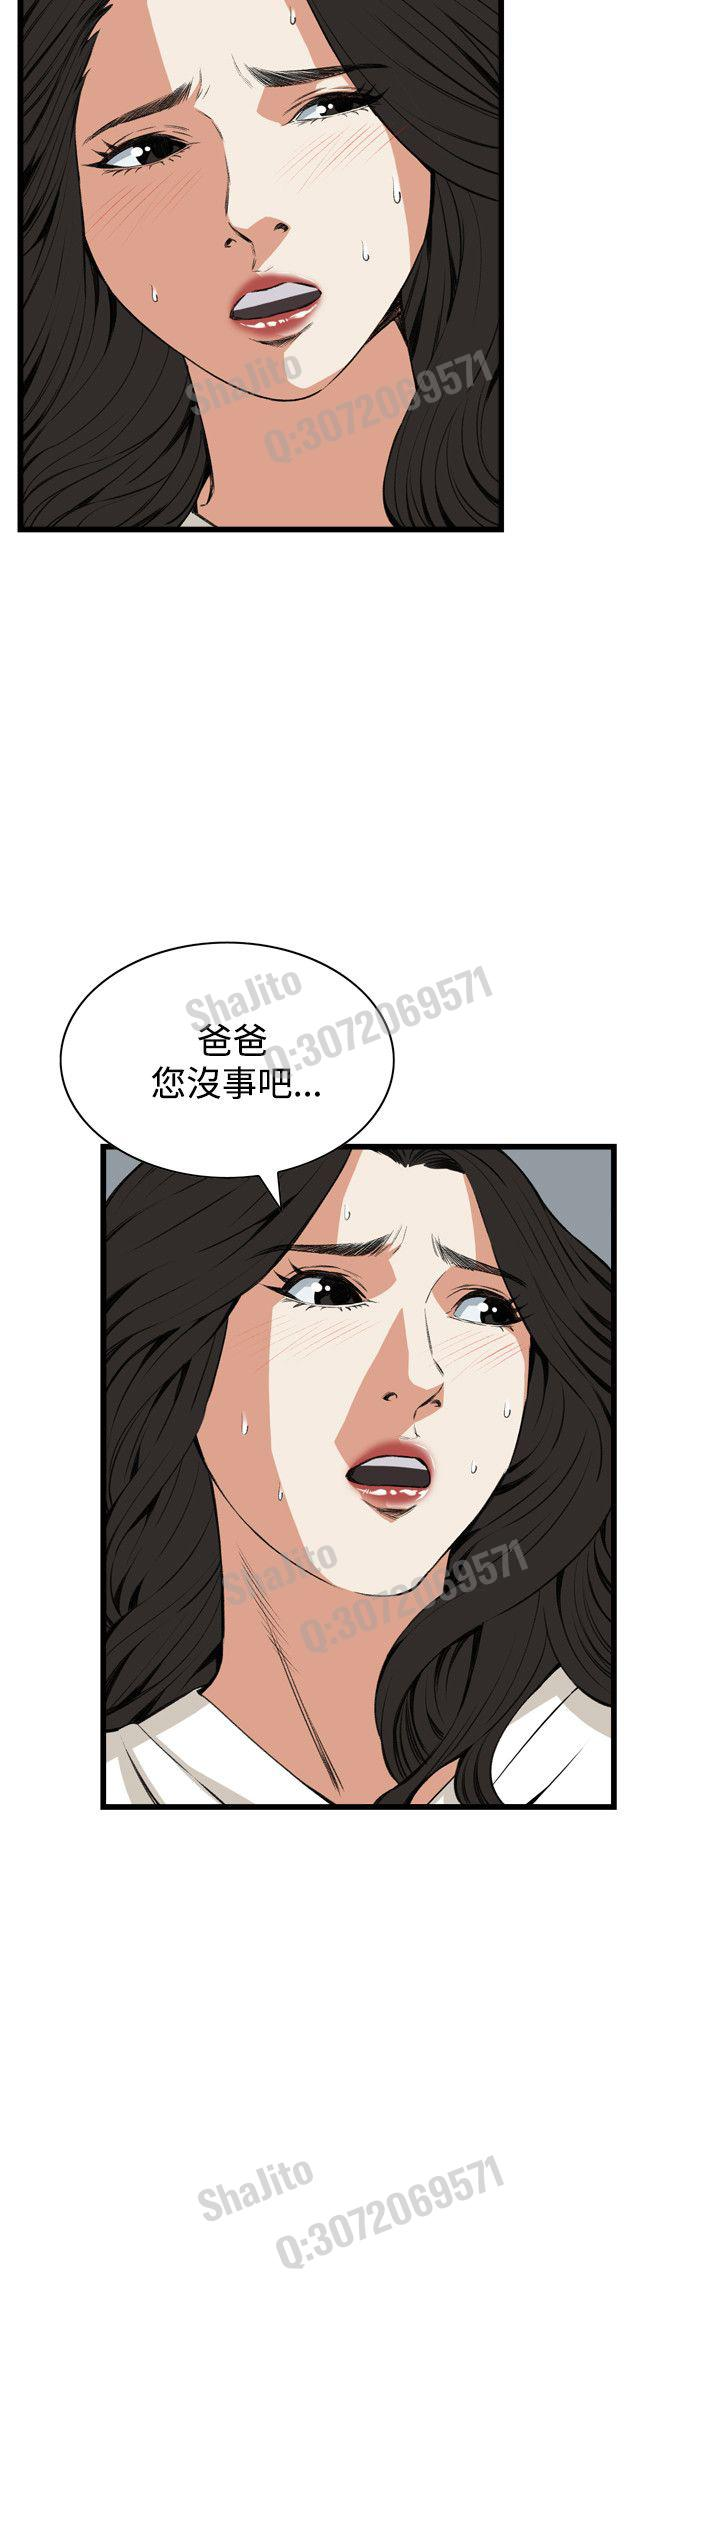 Take a peek 偷窥67-69 Chinese 7